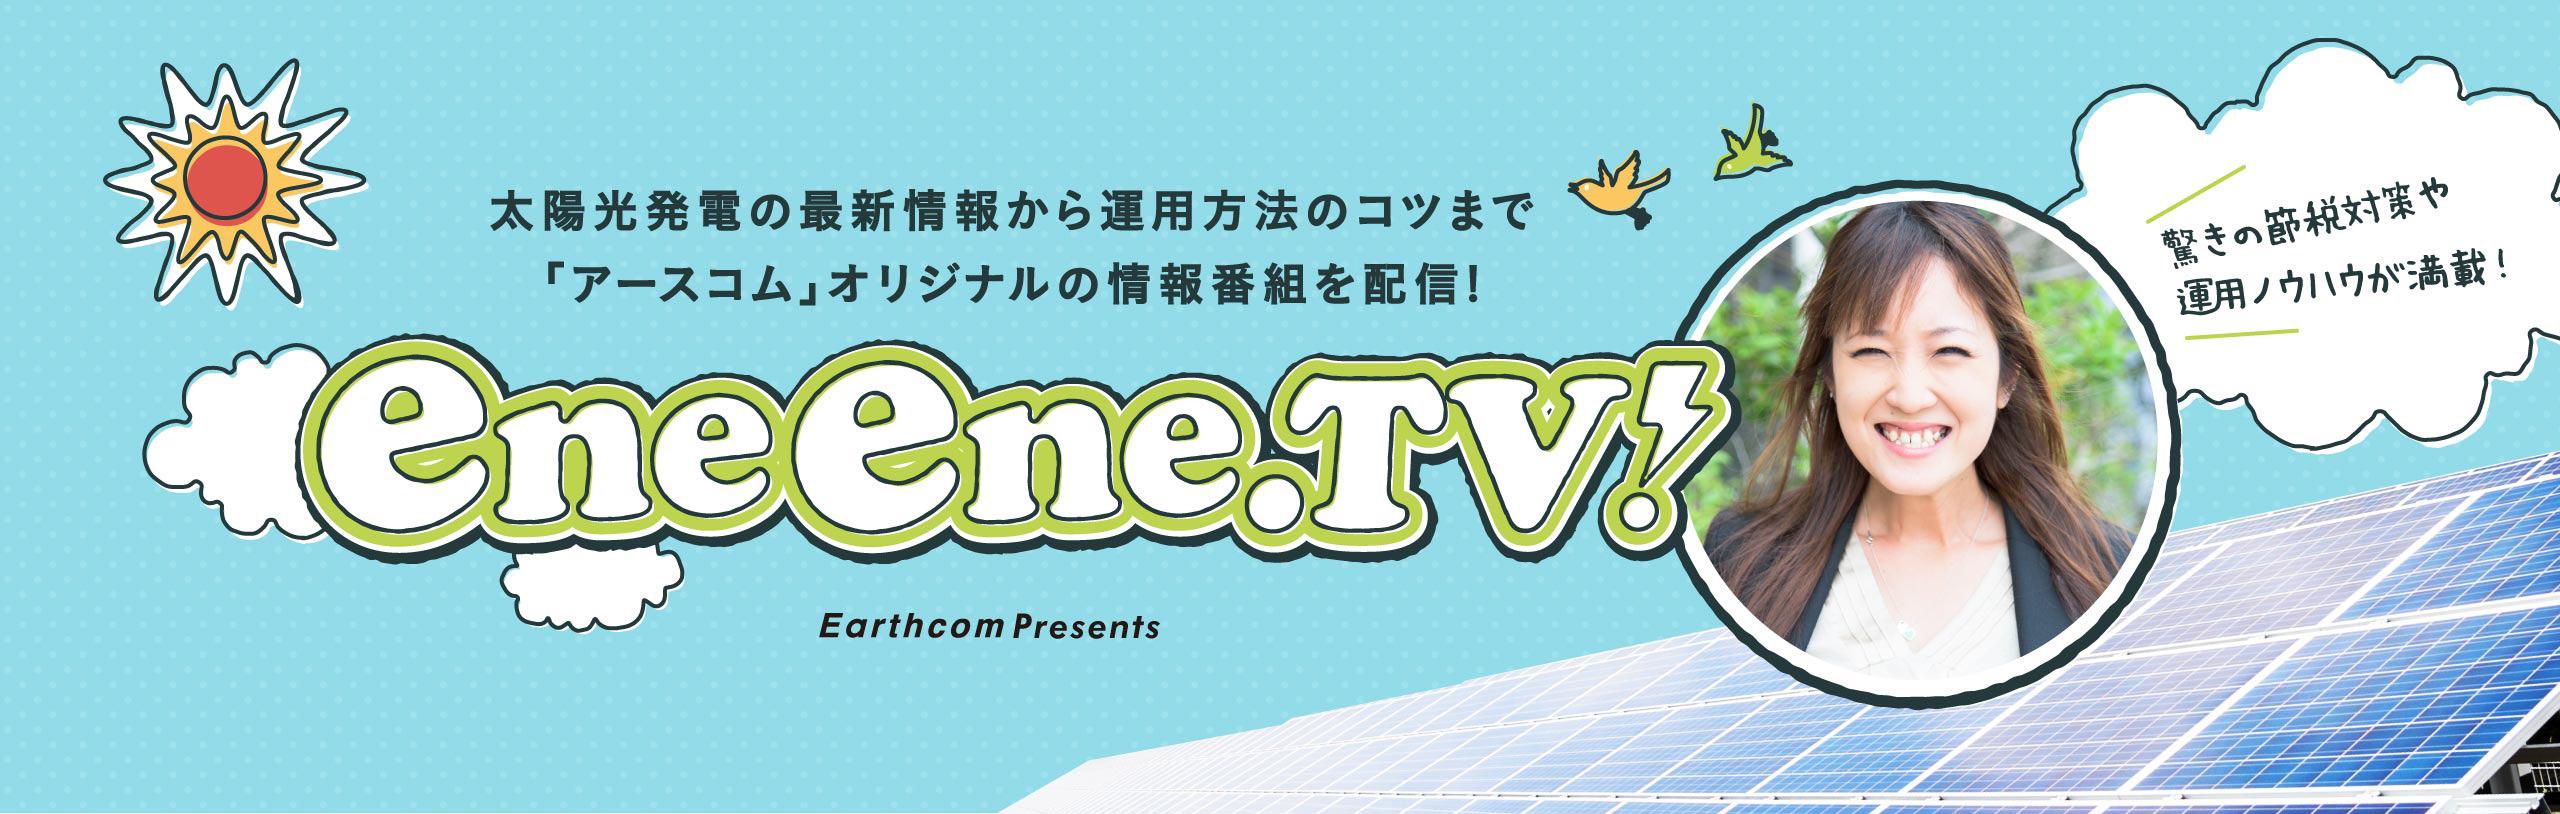 FPweb.TV